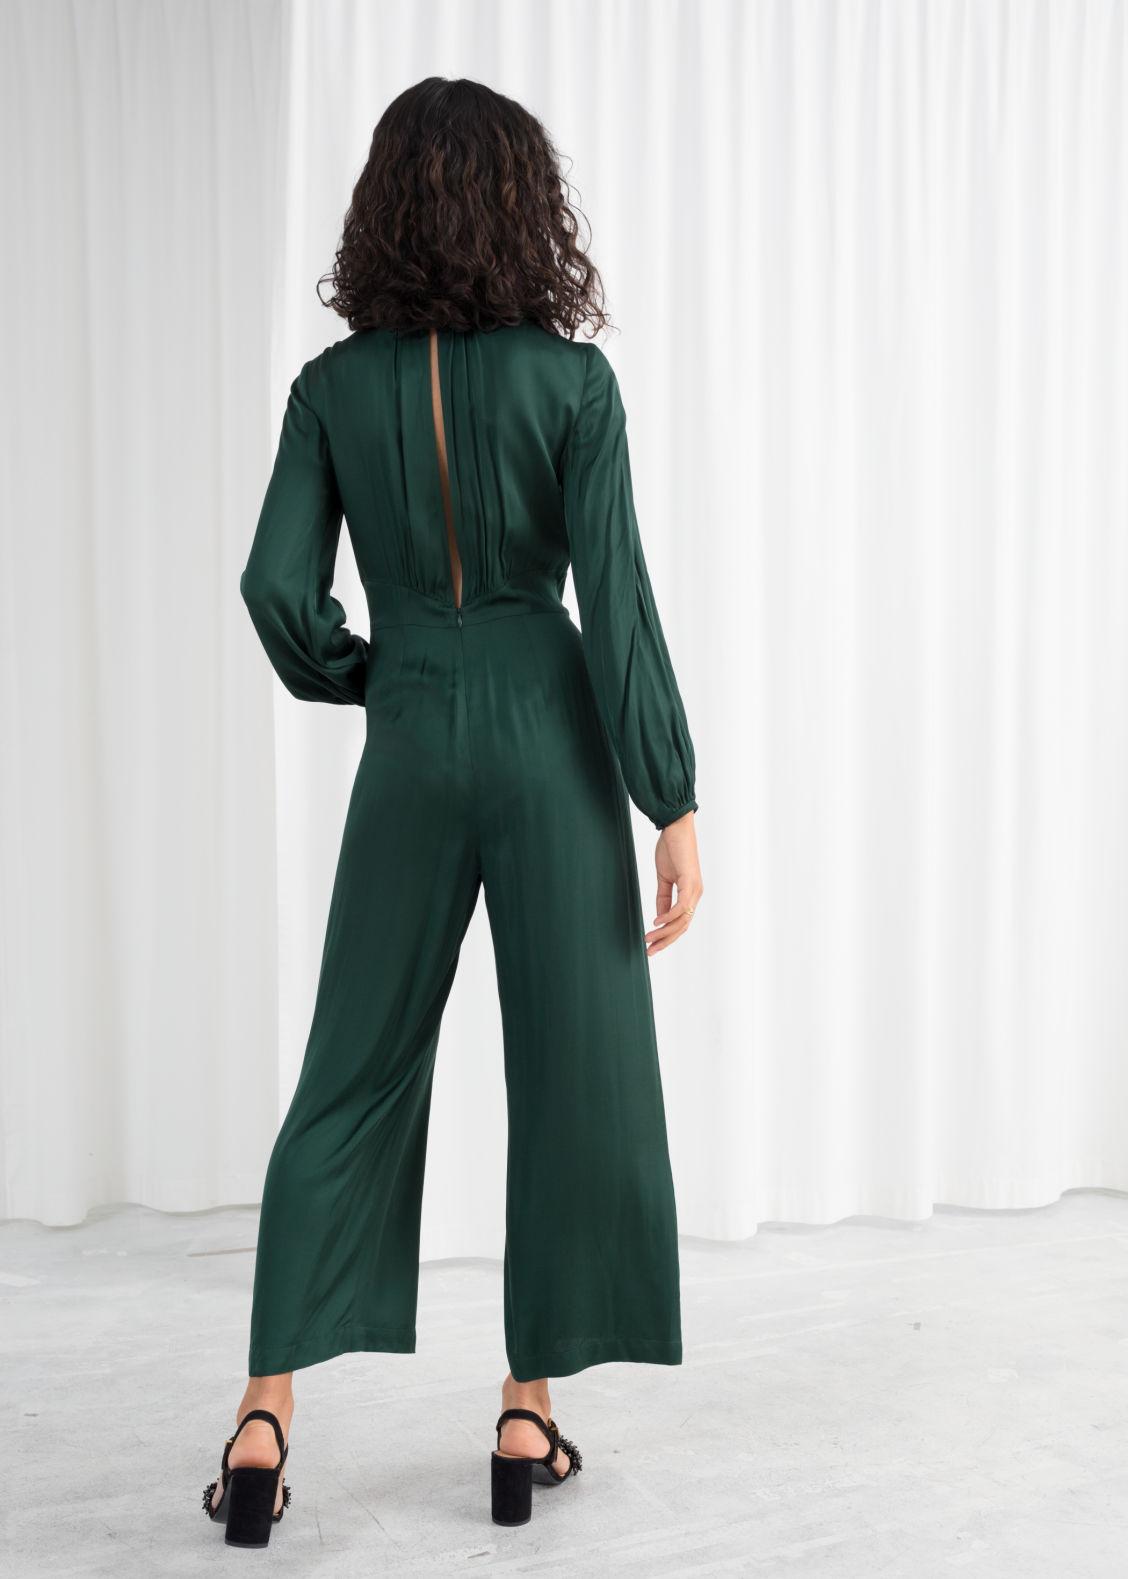 Long Sleeve Satin Jumpsuit Green Jumpsuits Amp Playsuits